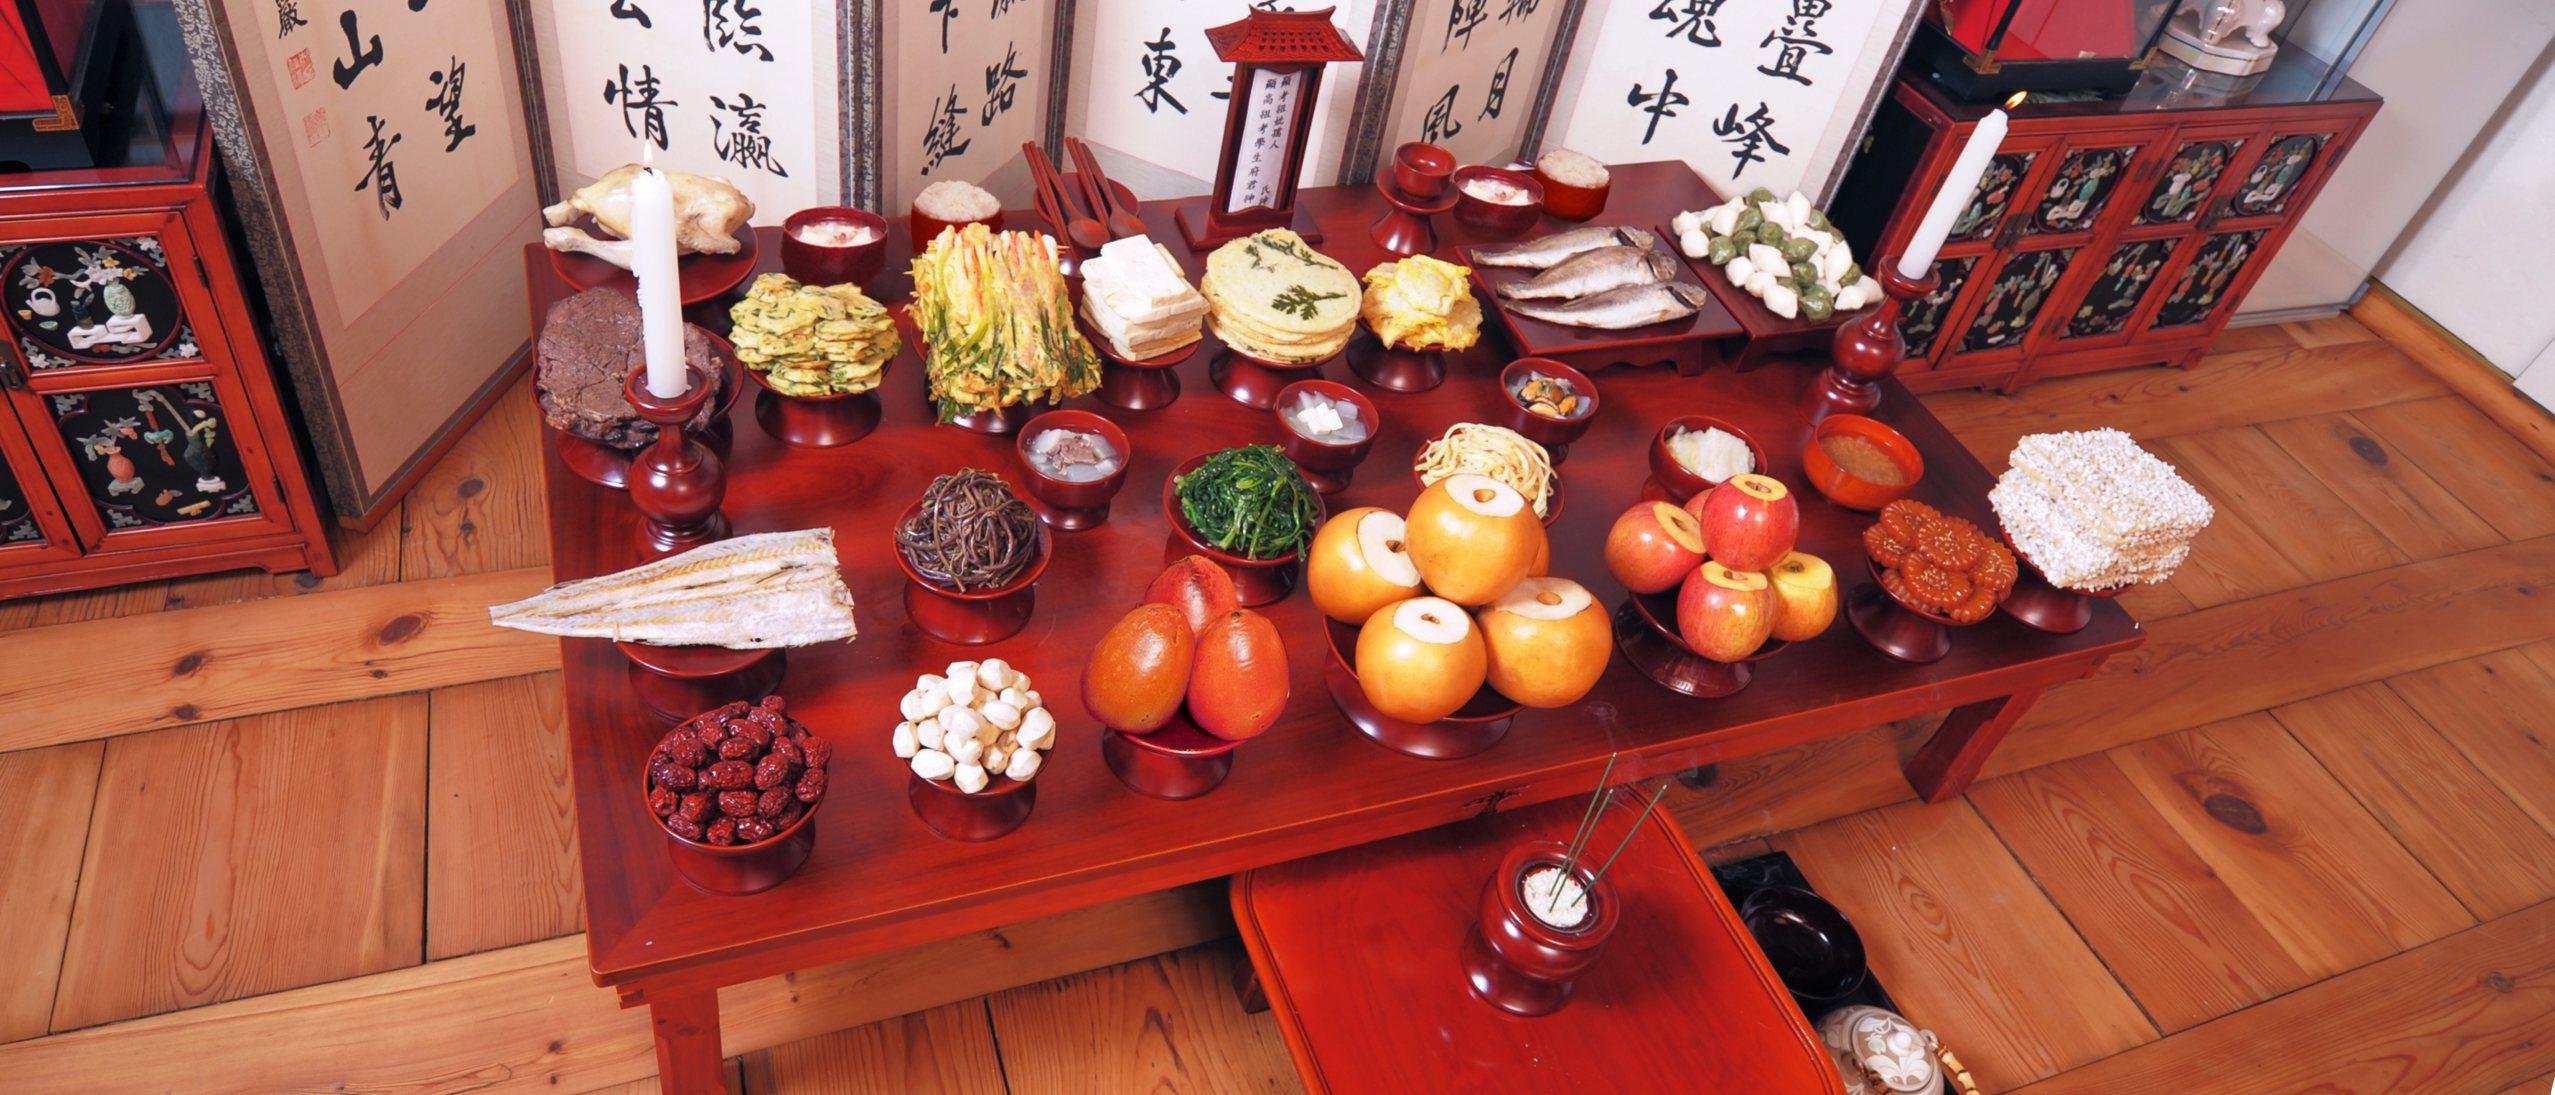 table setting for Seollal (Korean Lunar New Year)